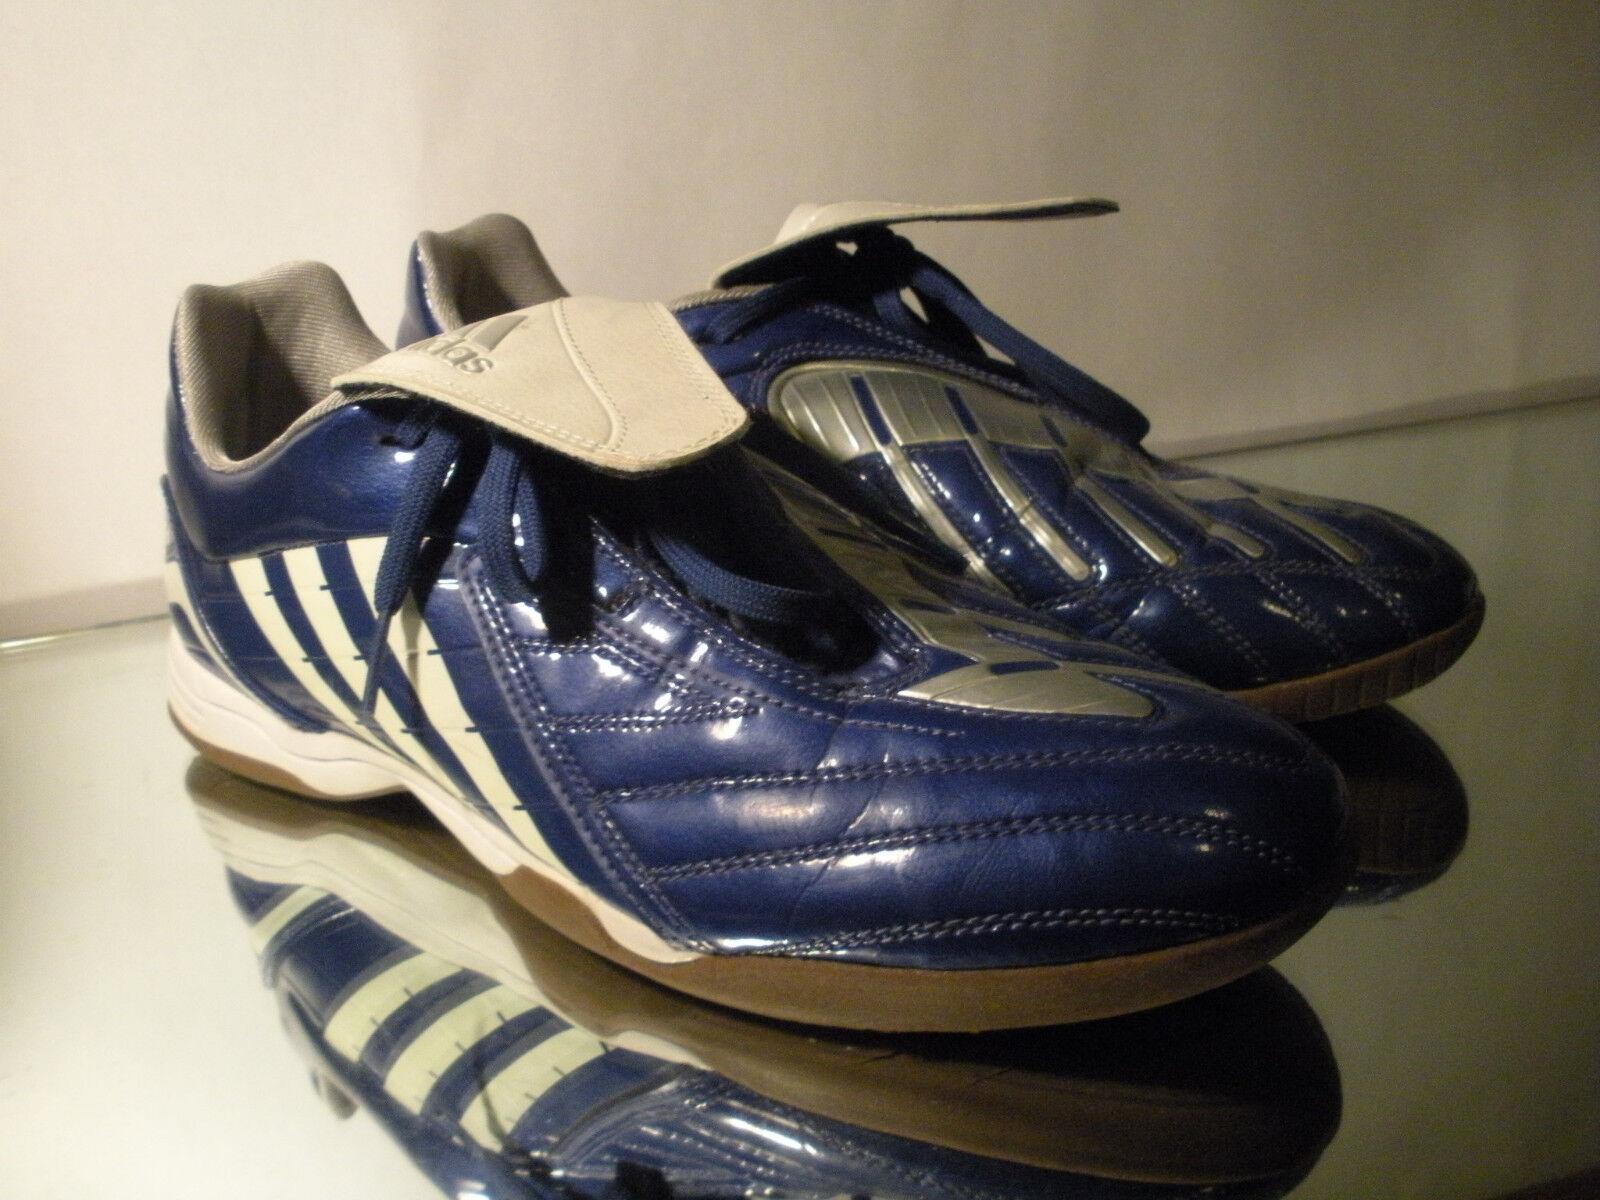 2d1d56d8c6e Adidas Predator Powerswerve Absolado Indoor Soccer Soccer Soccer Flat shoes  blueee White Sz 11.5 c9806f